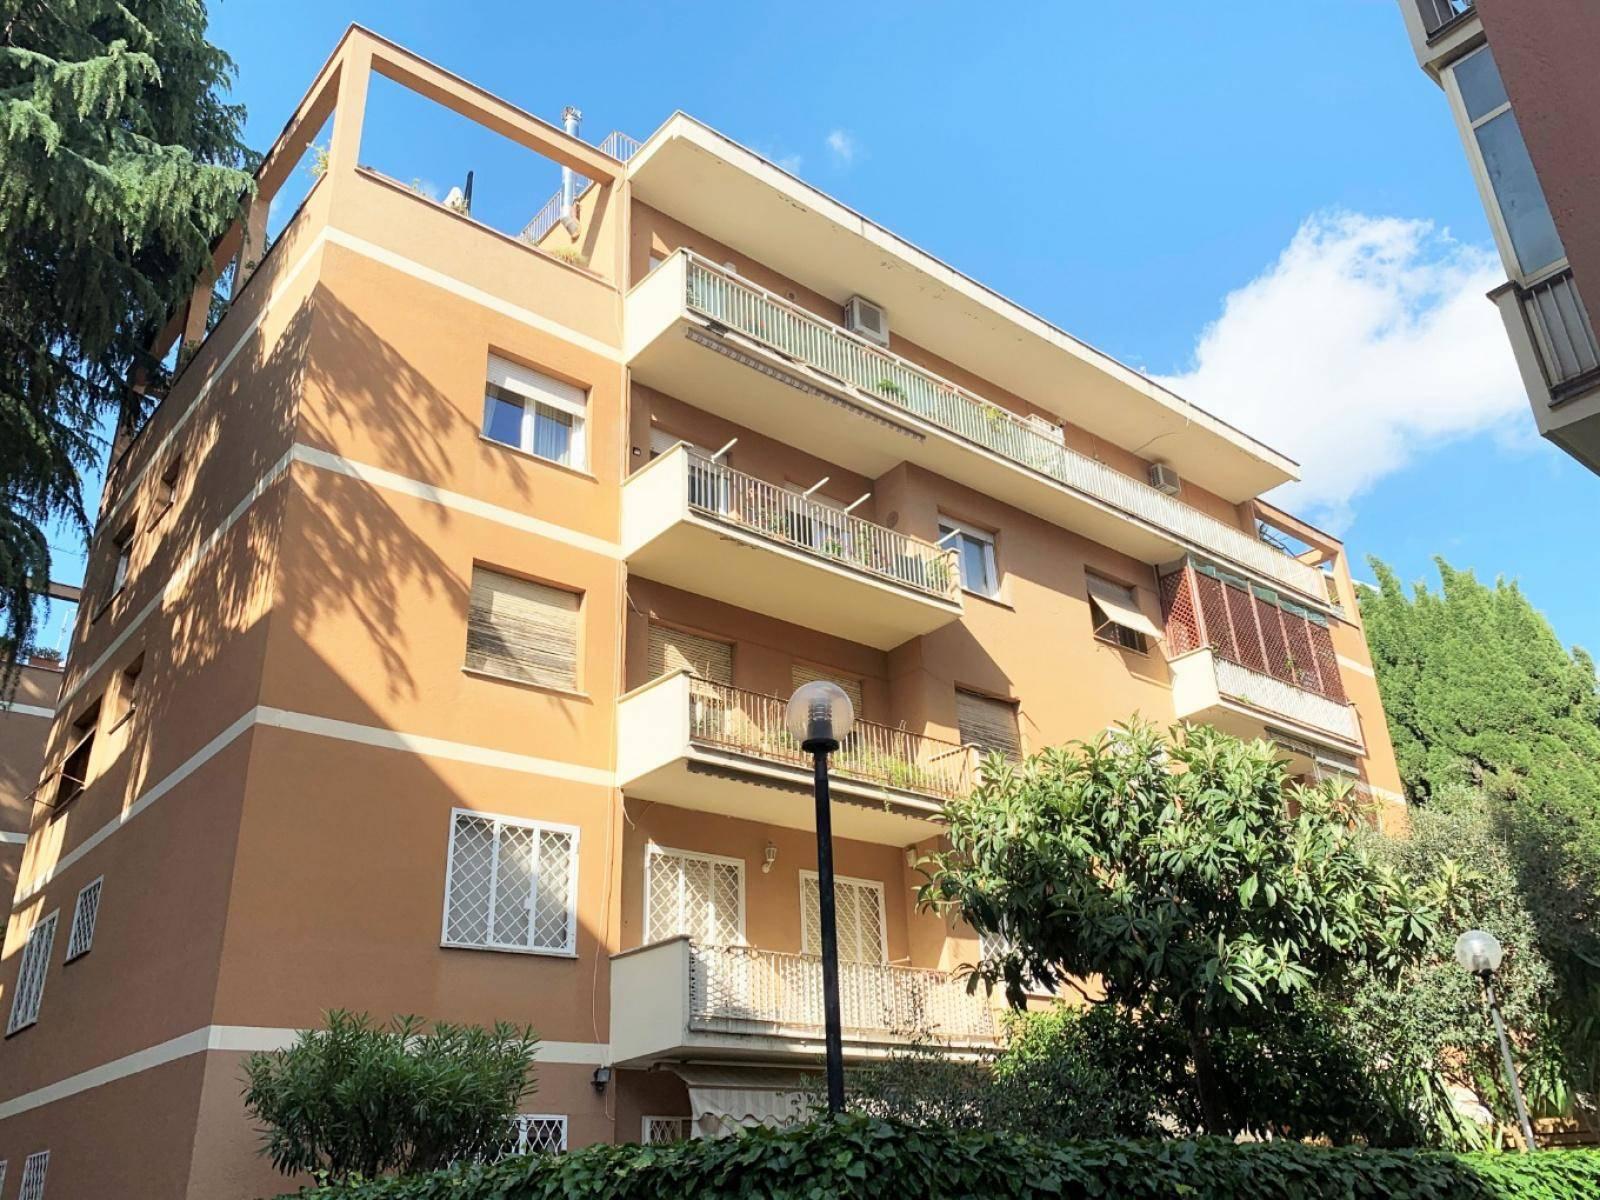 1118417543 Pentalocale in Via Licinio Calvo, Roma, Zona Balduina